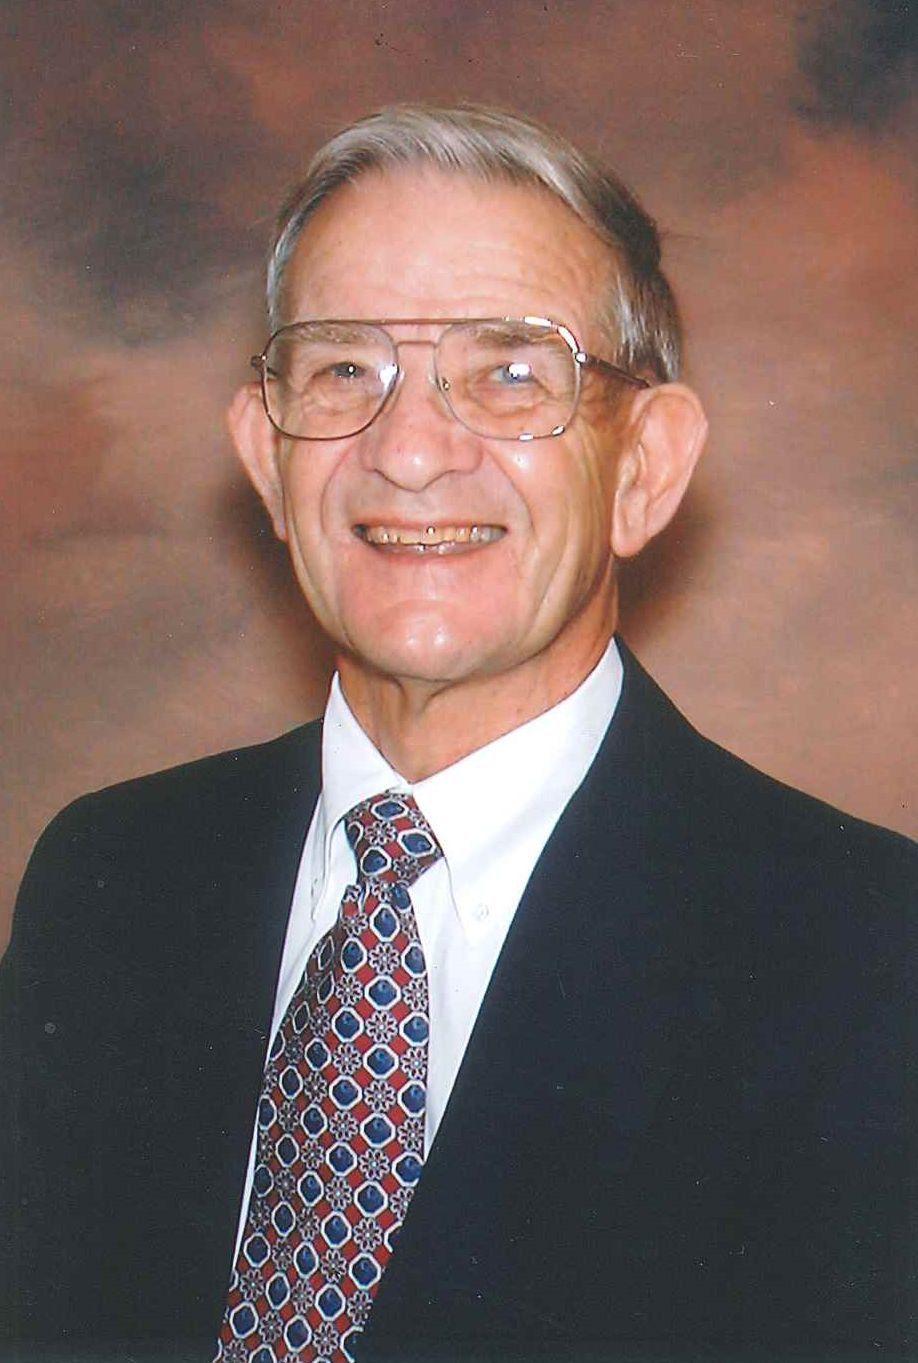 James Bowers